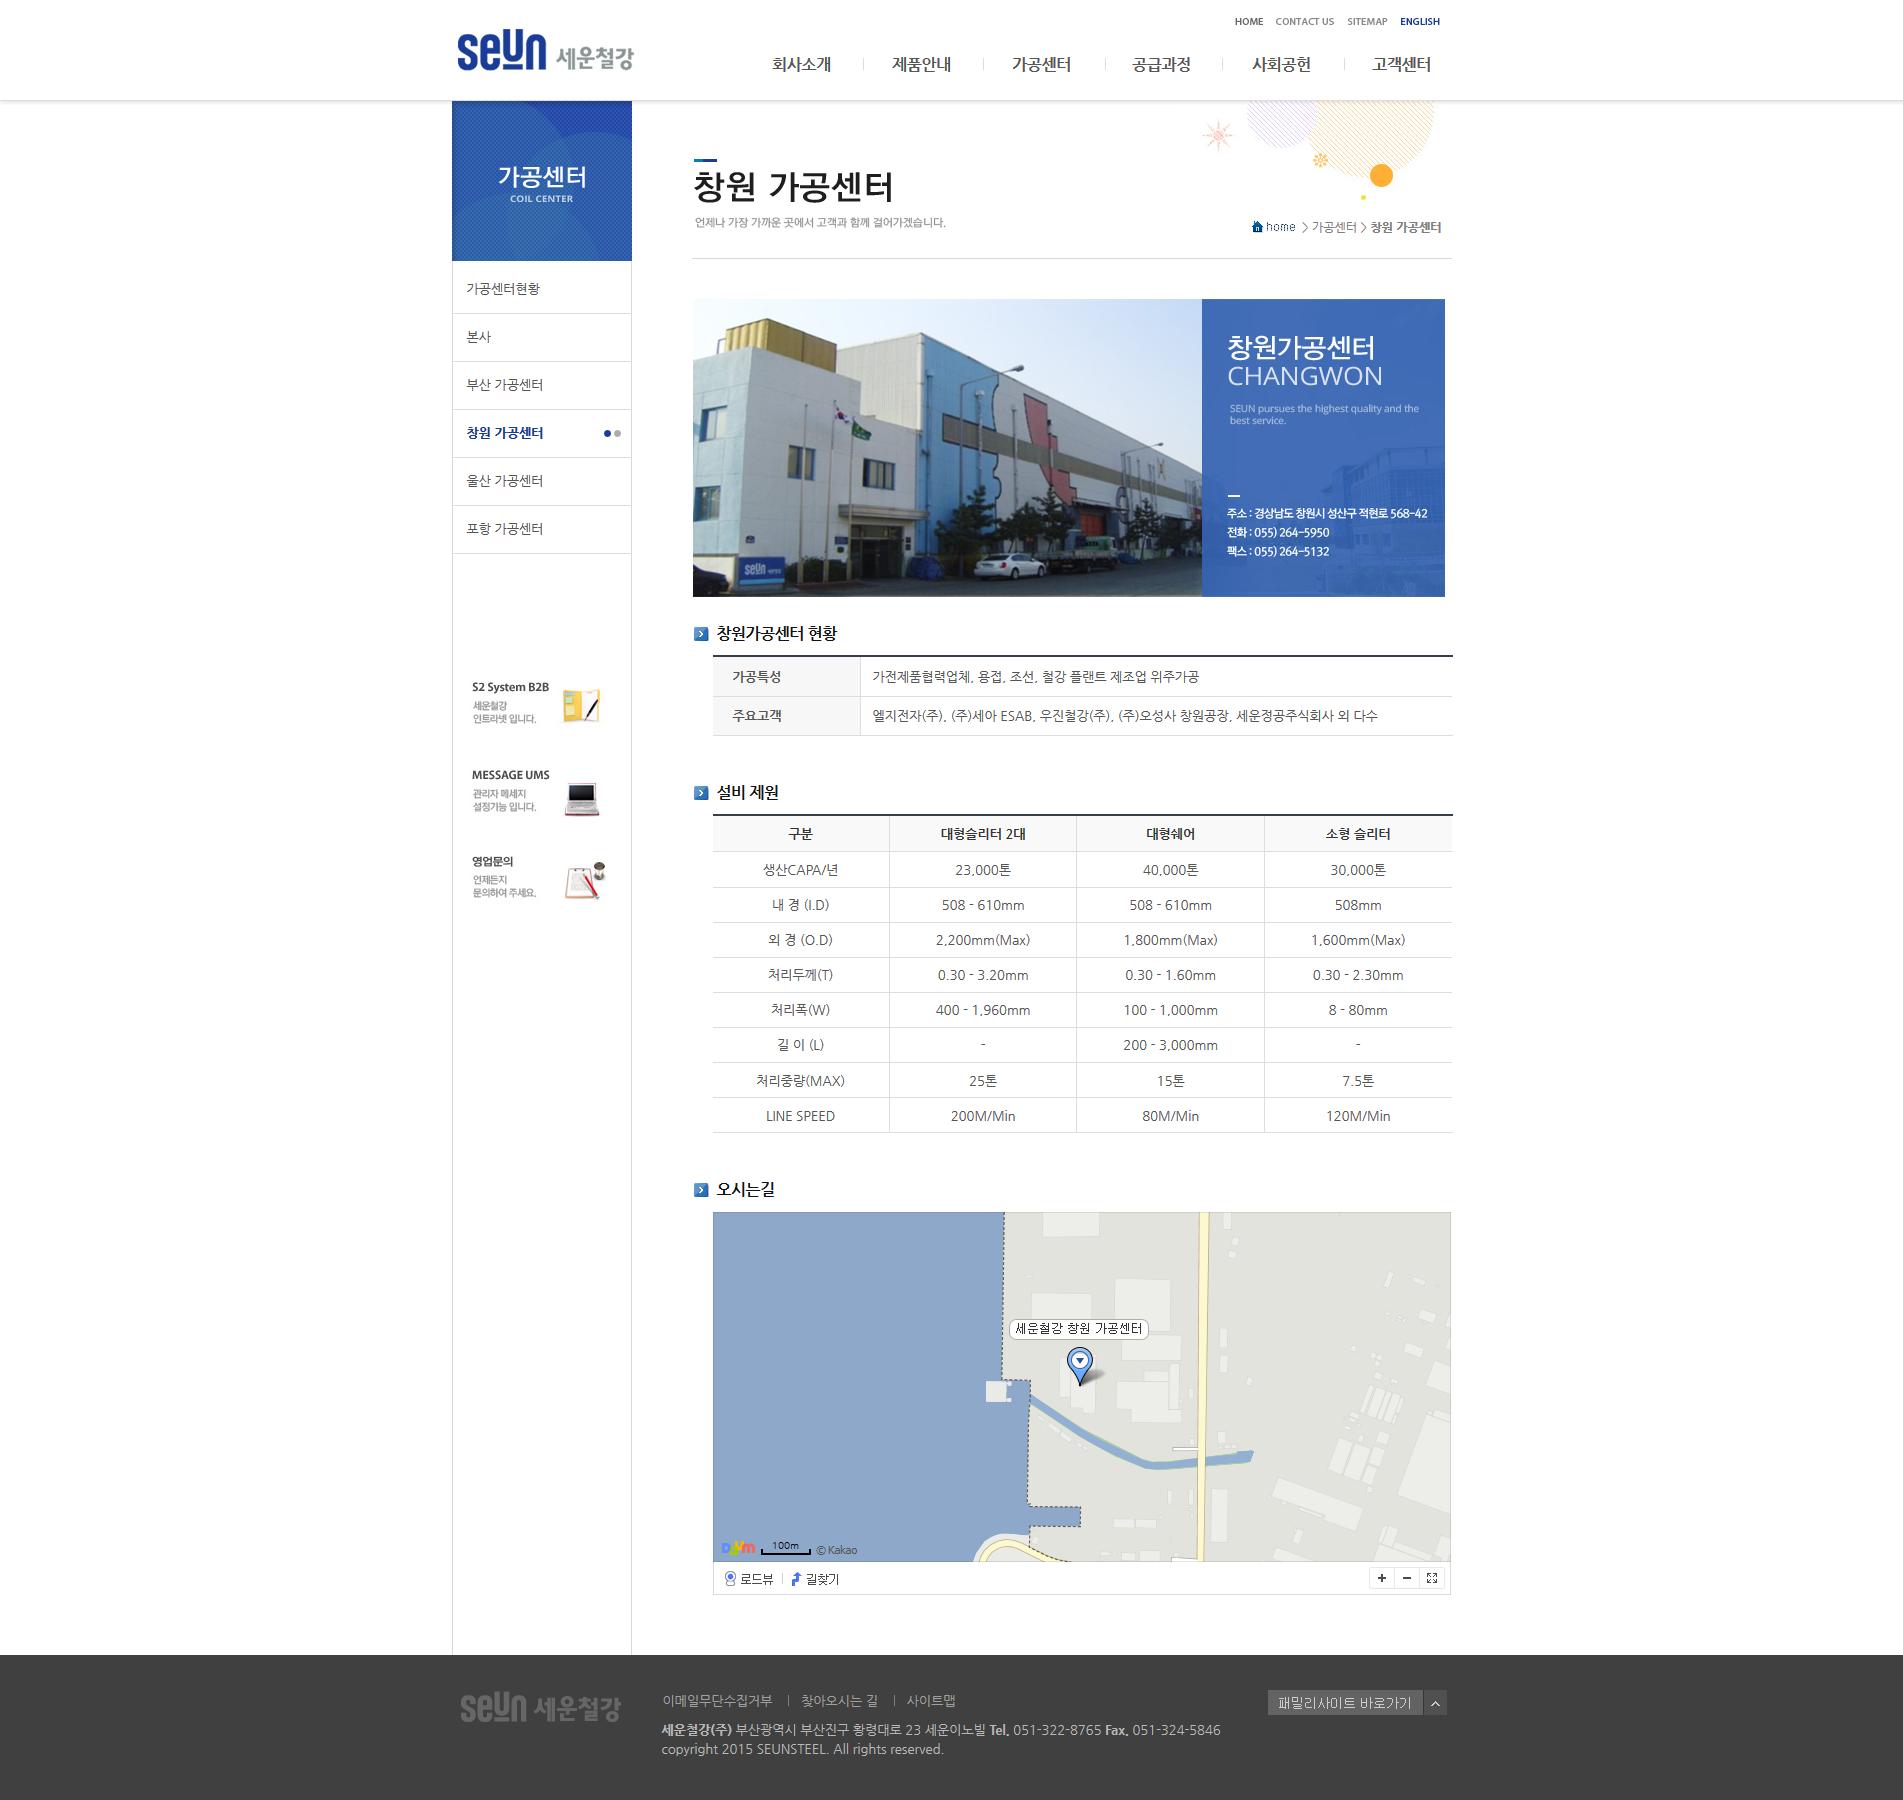 Screenshot-2018-1-4 세운철강(2).png